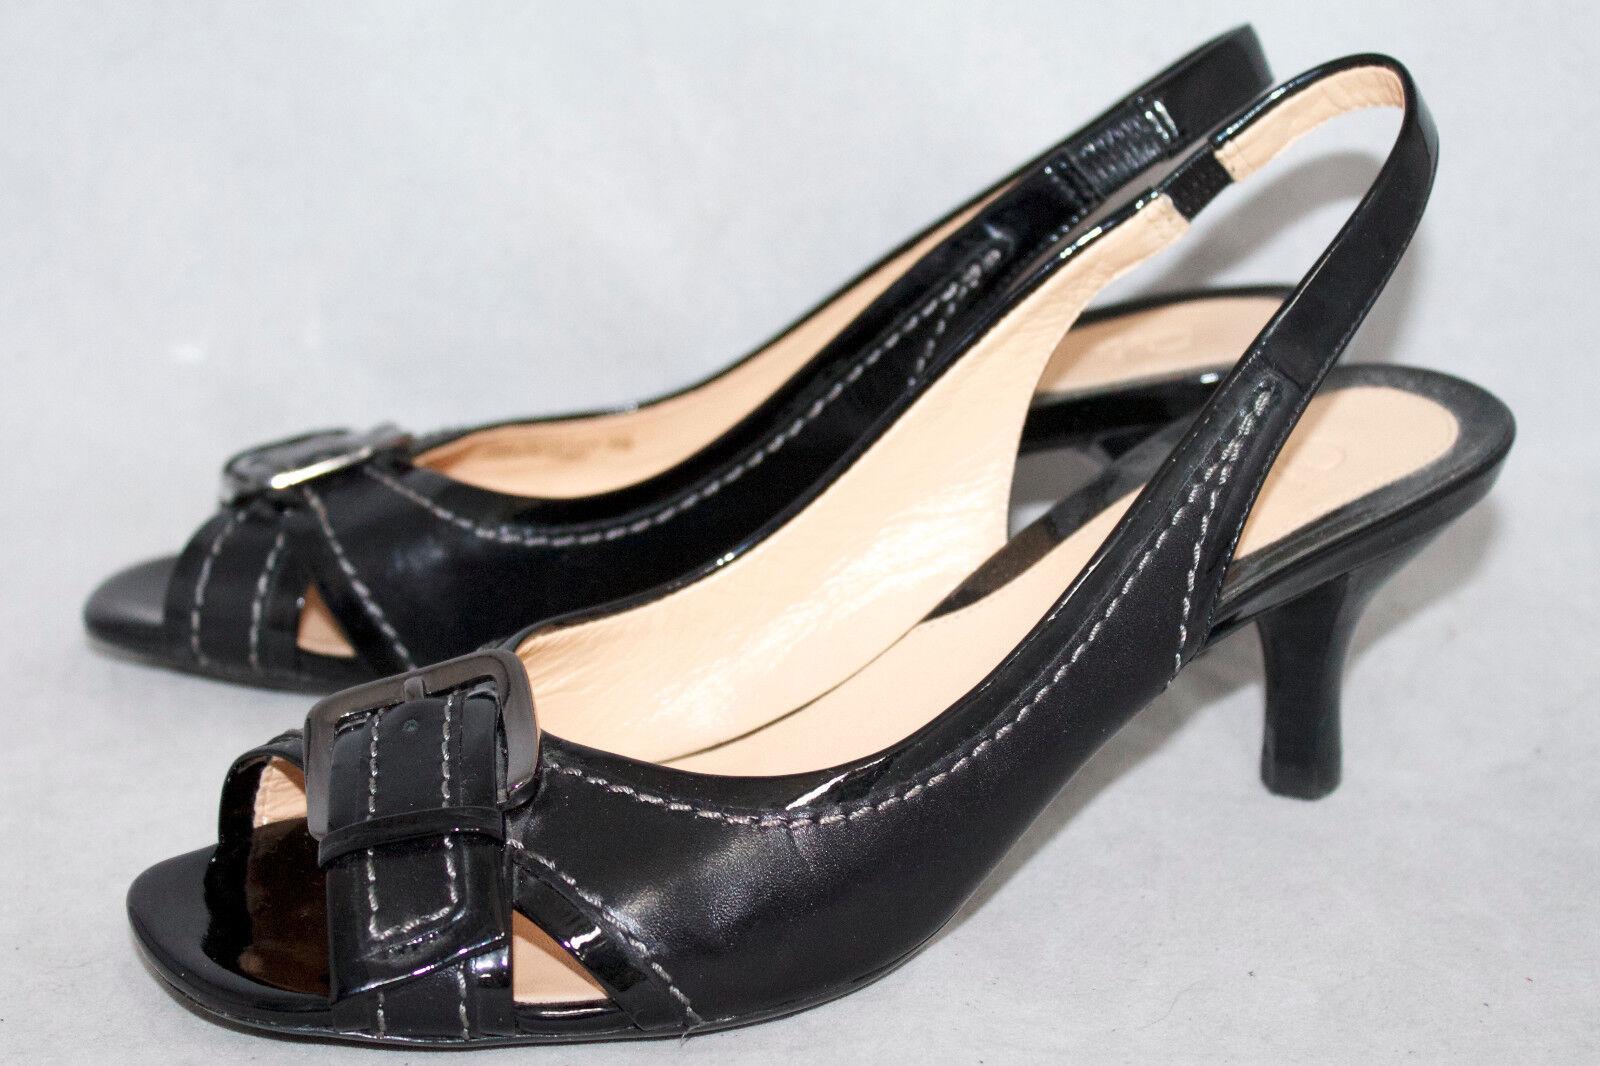 COLE HAAN Wo's 6B Black Patent Slingback Kitten Heel Peep Toe Toe Peep Buckle Pump D28545 cd5e18